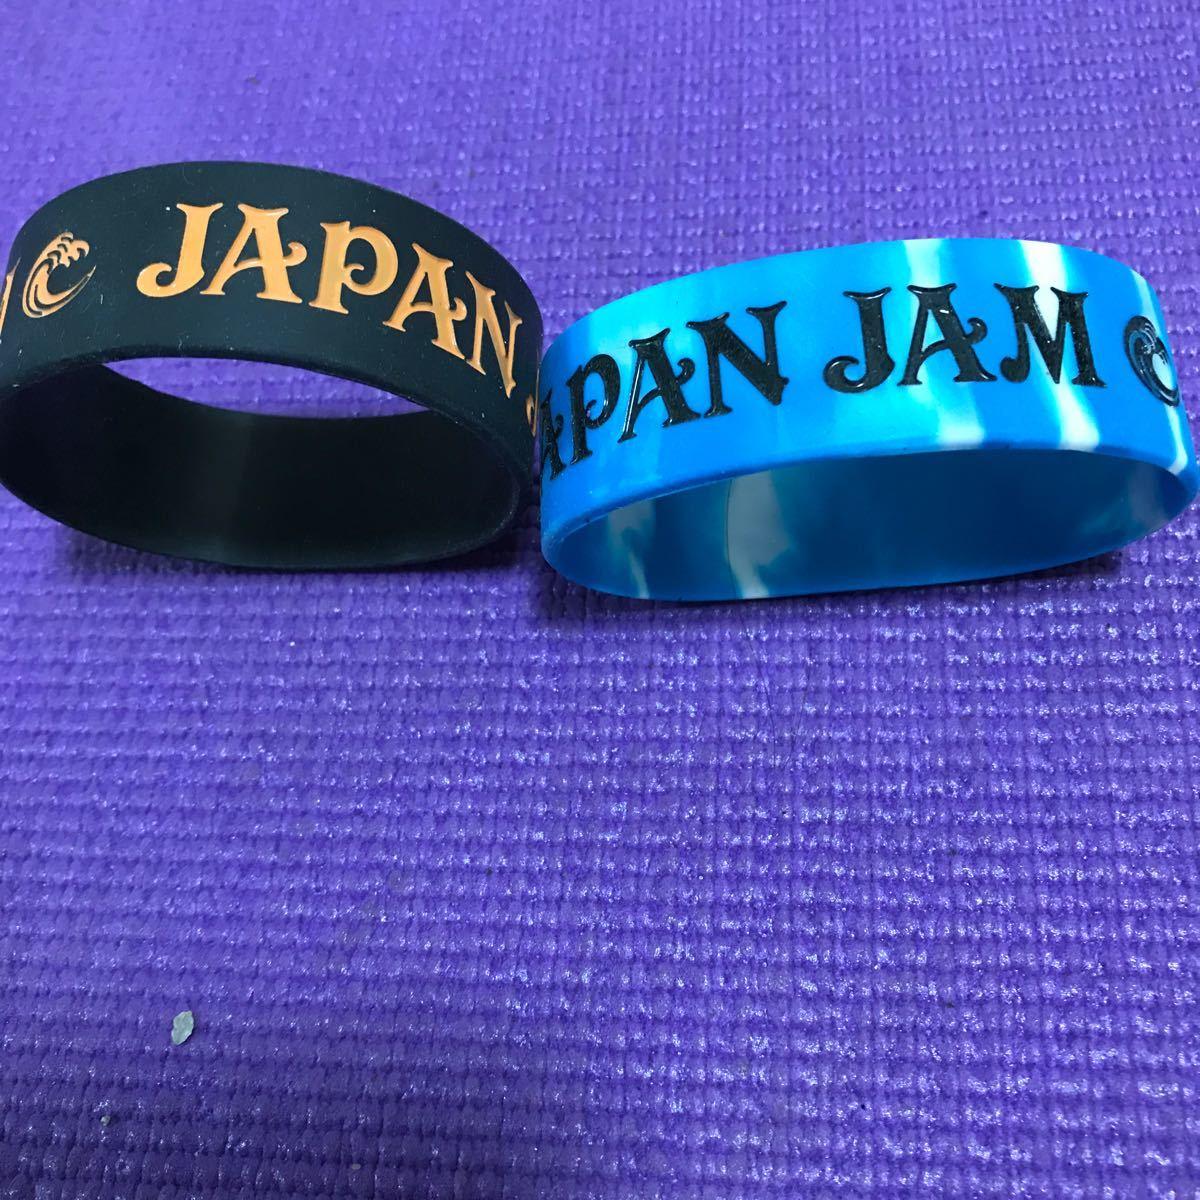 japan jam ラバーバンド ジャパンジャム